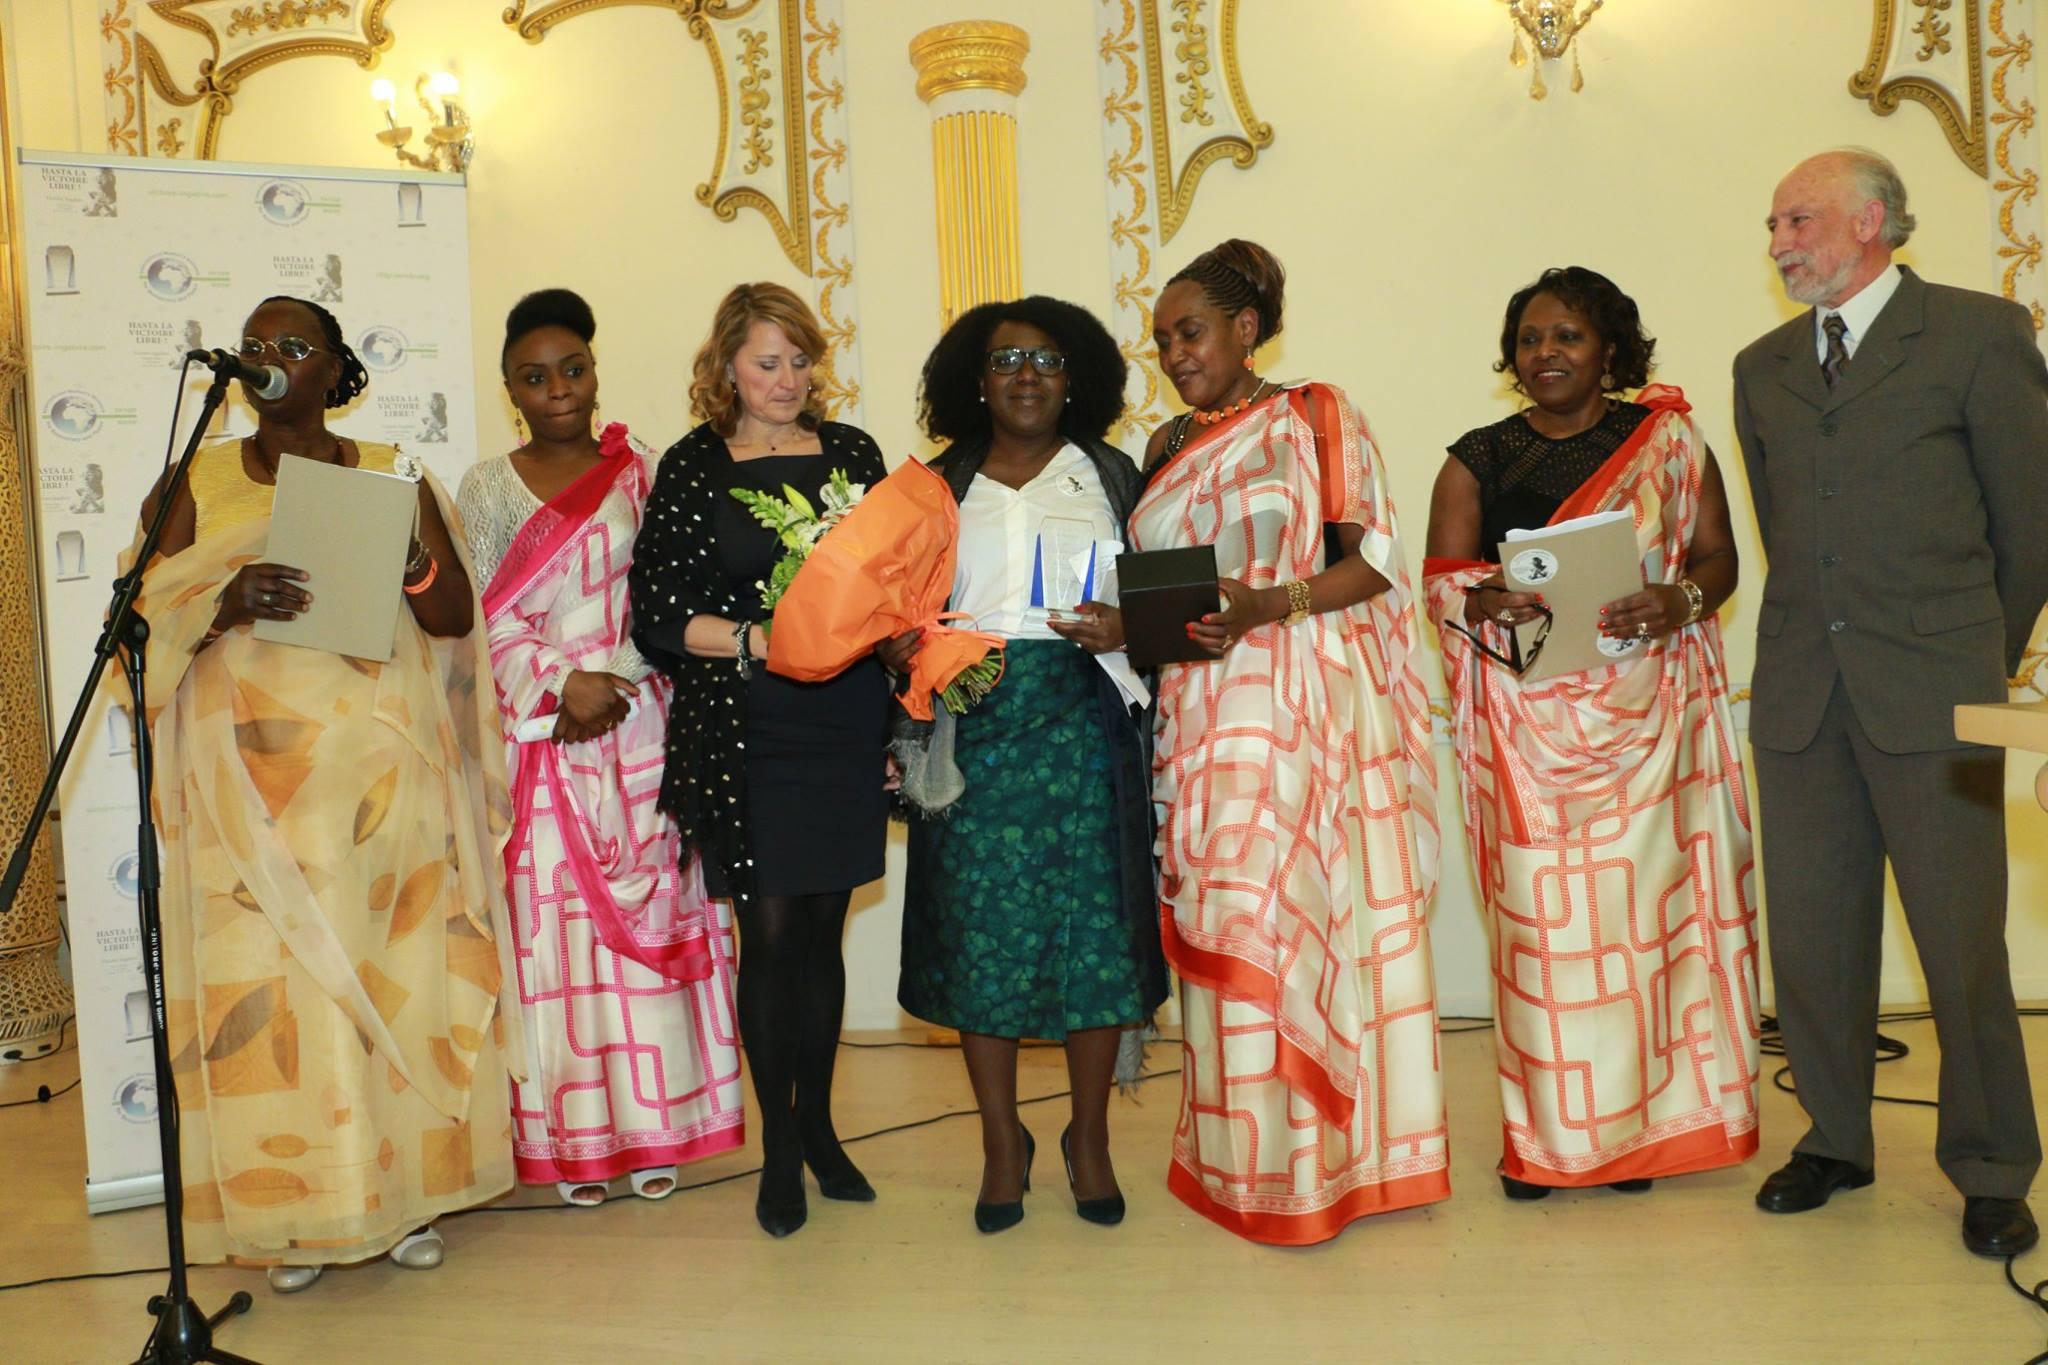 123 essays org momento de la entrega del premio victoire ingabire a la libertad de pensamiento a la congoleatildeplusmna bk kumbi posando junto a miembros del jurado y la madrina